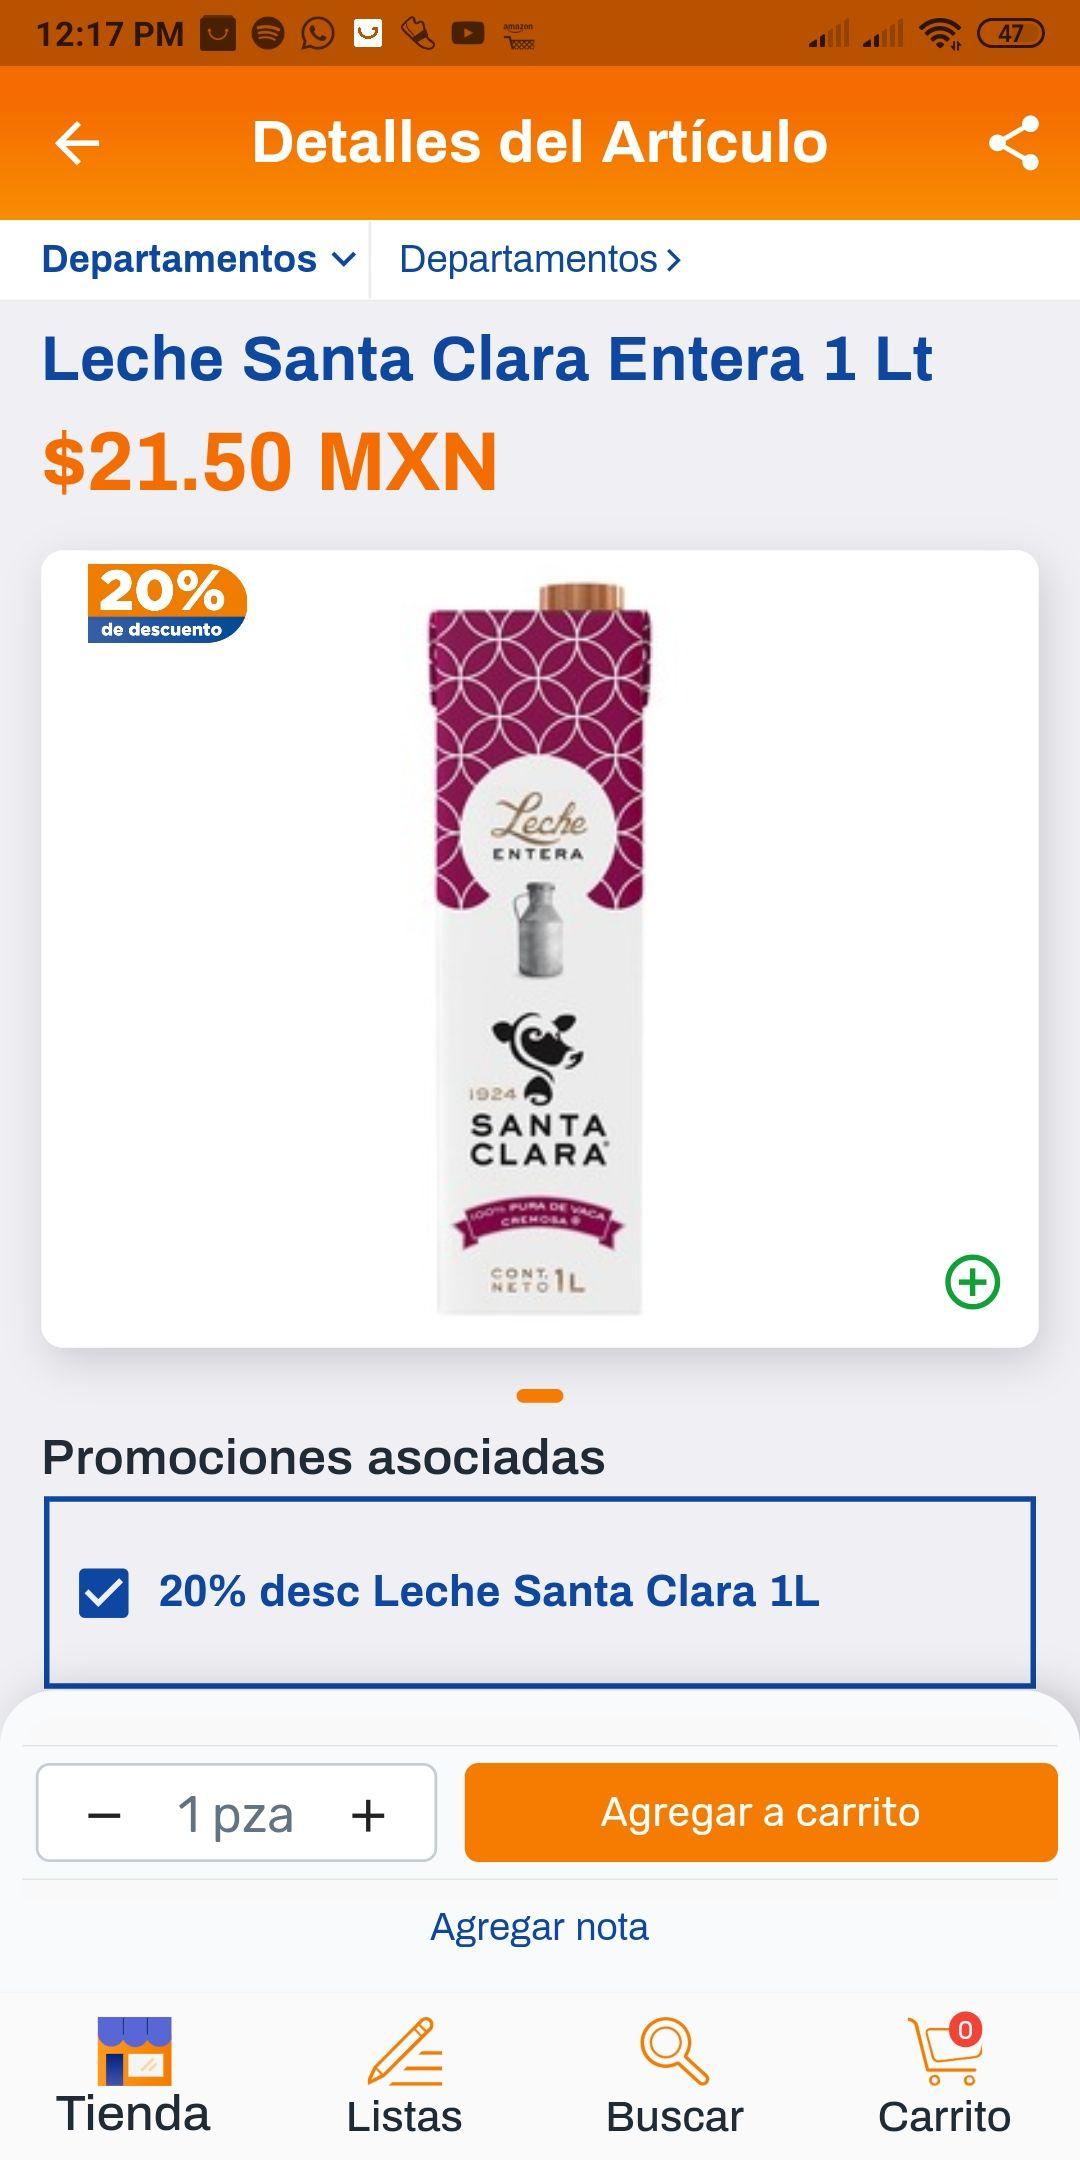 Chedraui Leche Santa Clara Entera 1 Lt